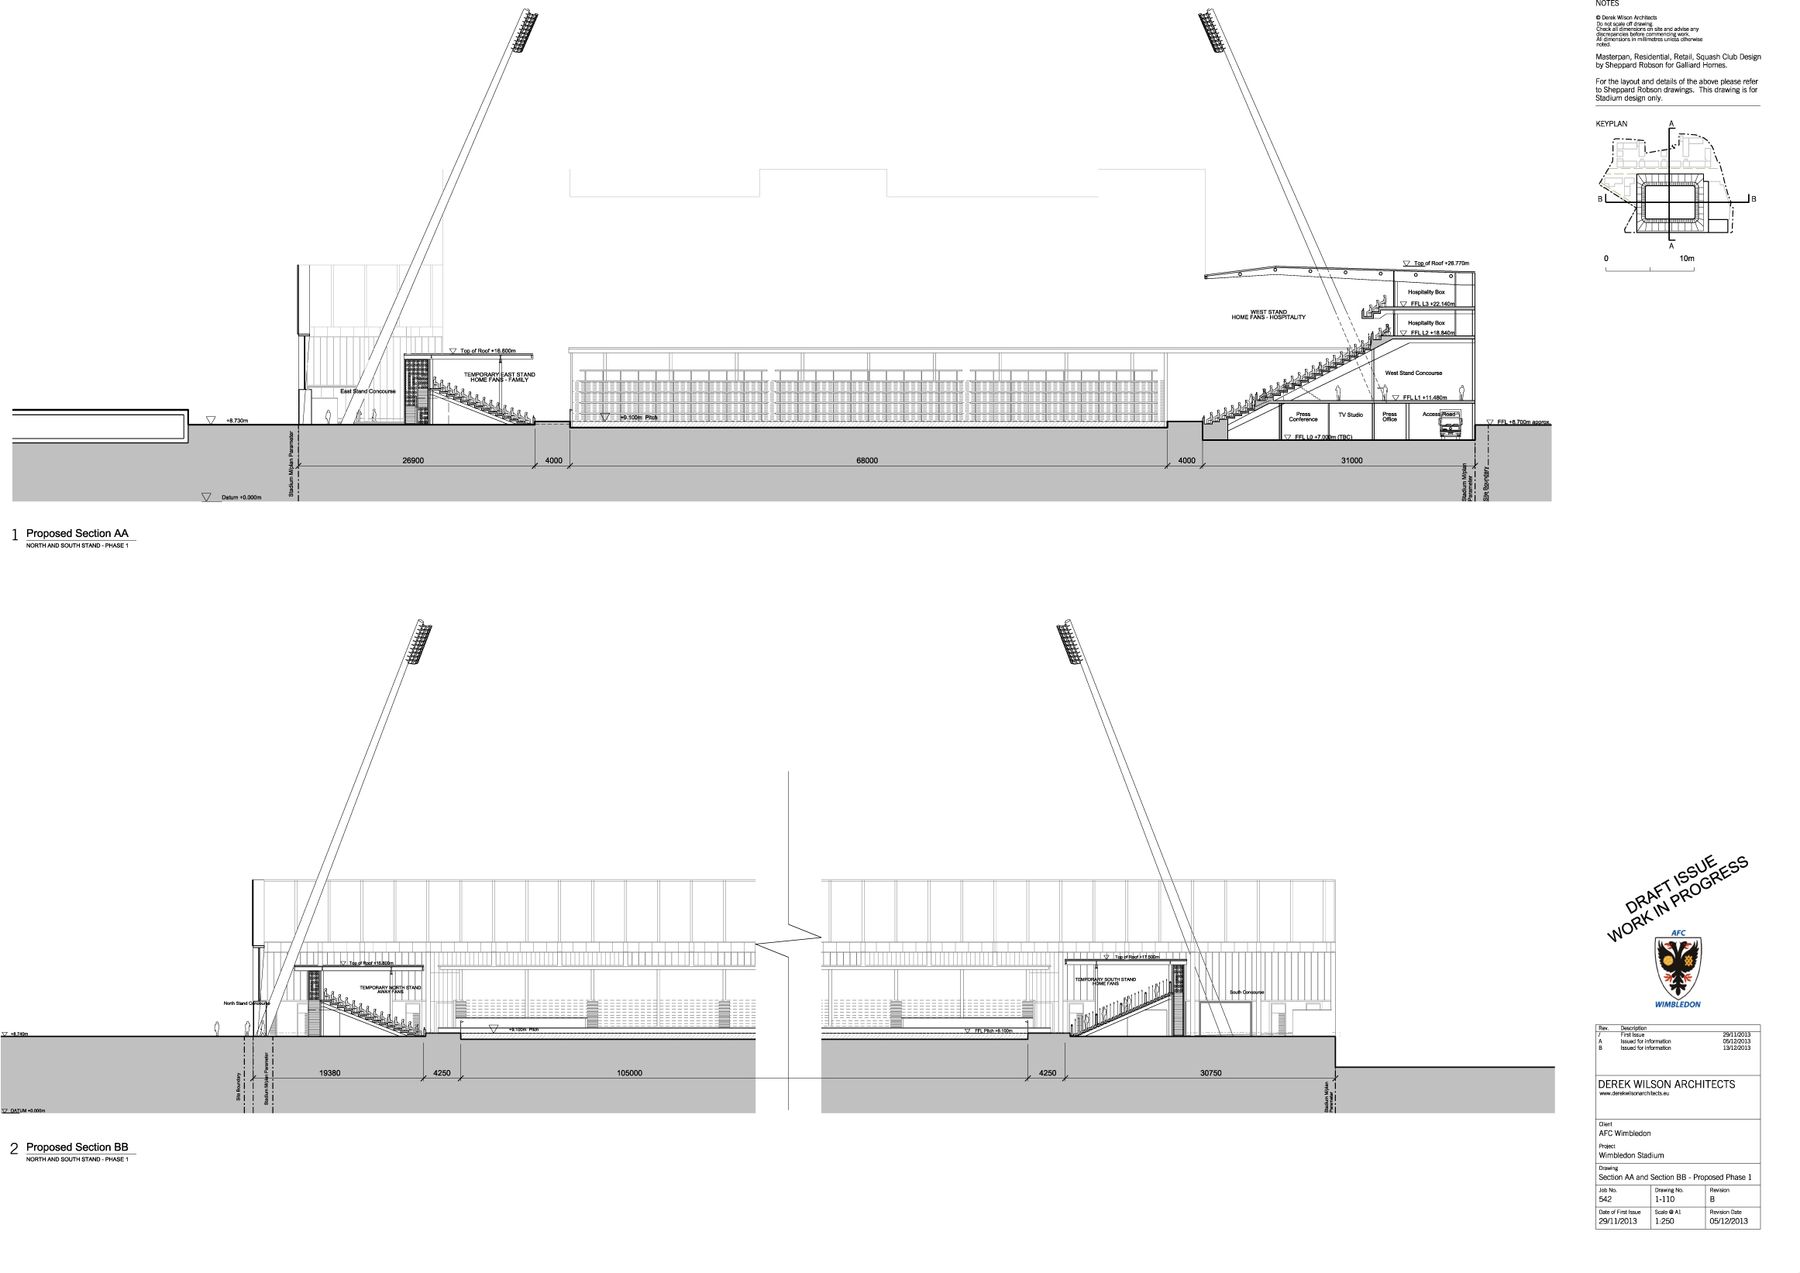 Design plough lane stadiumdb 2014 afc wimbledon plough lane malvernweather Gallery